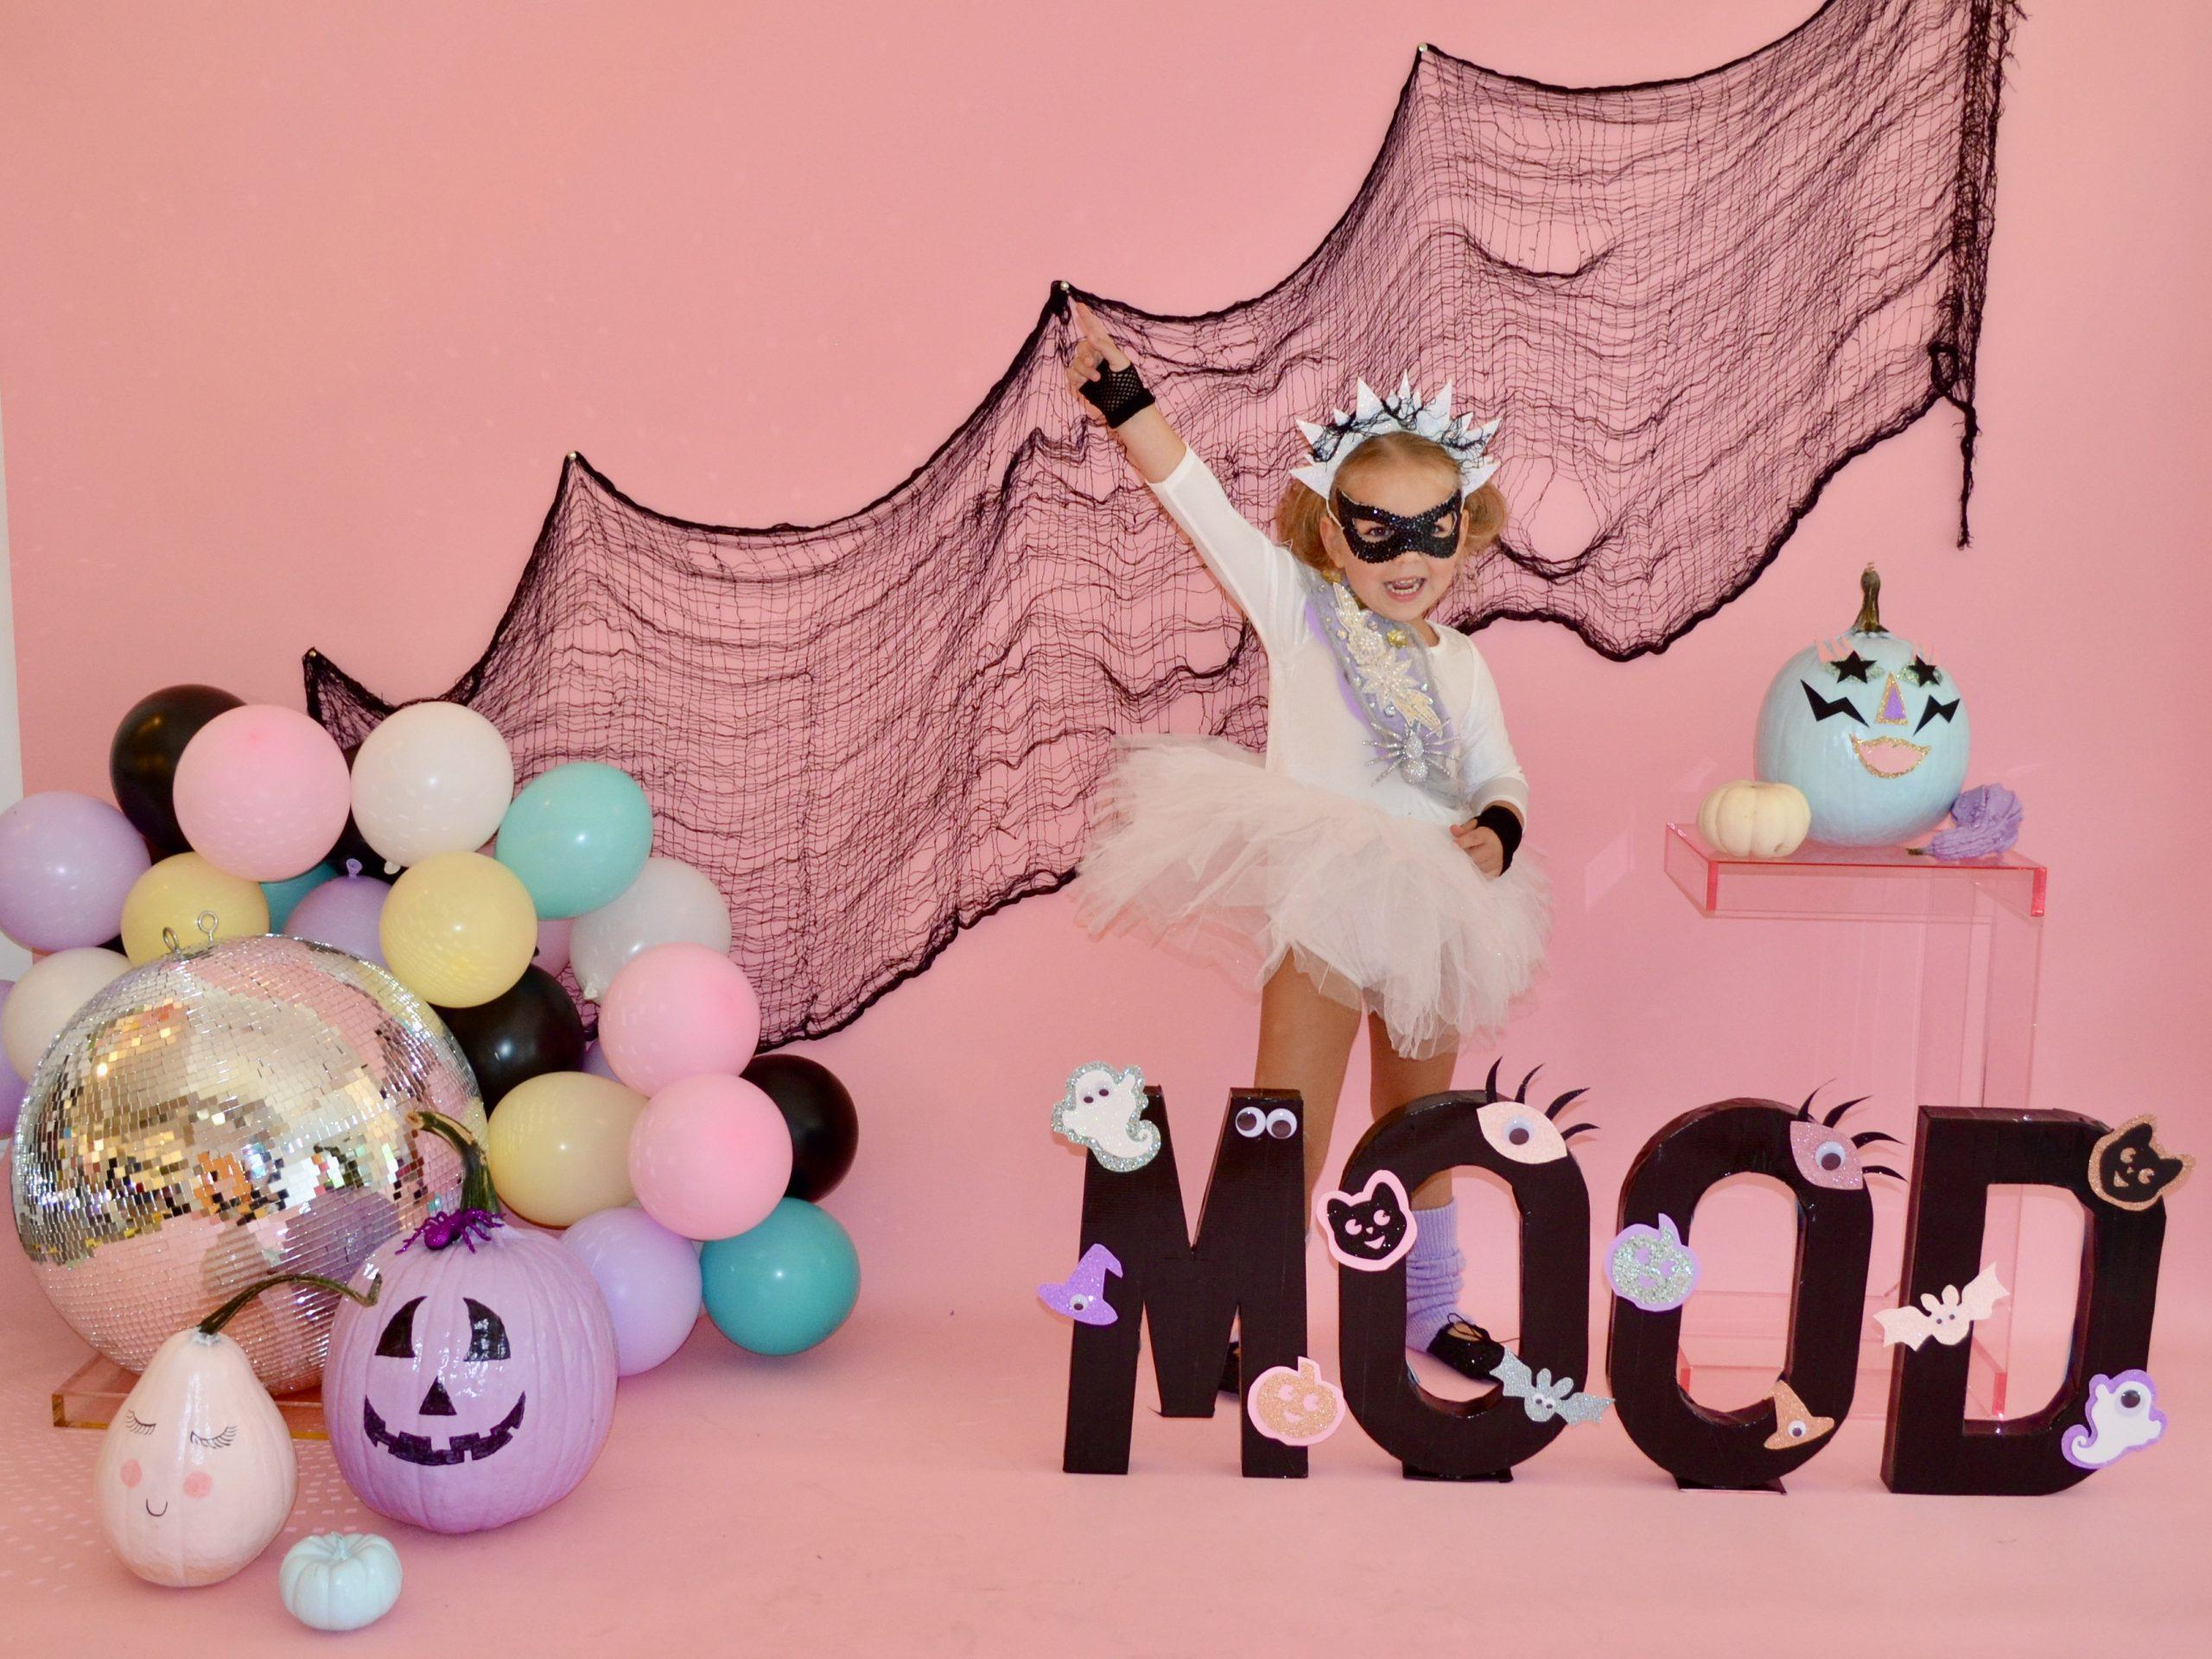 Adorable preschool dancer on a pastel Halloween background